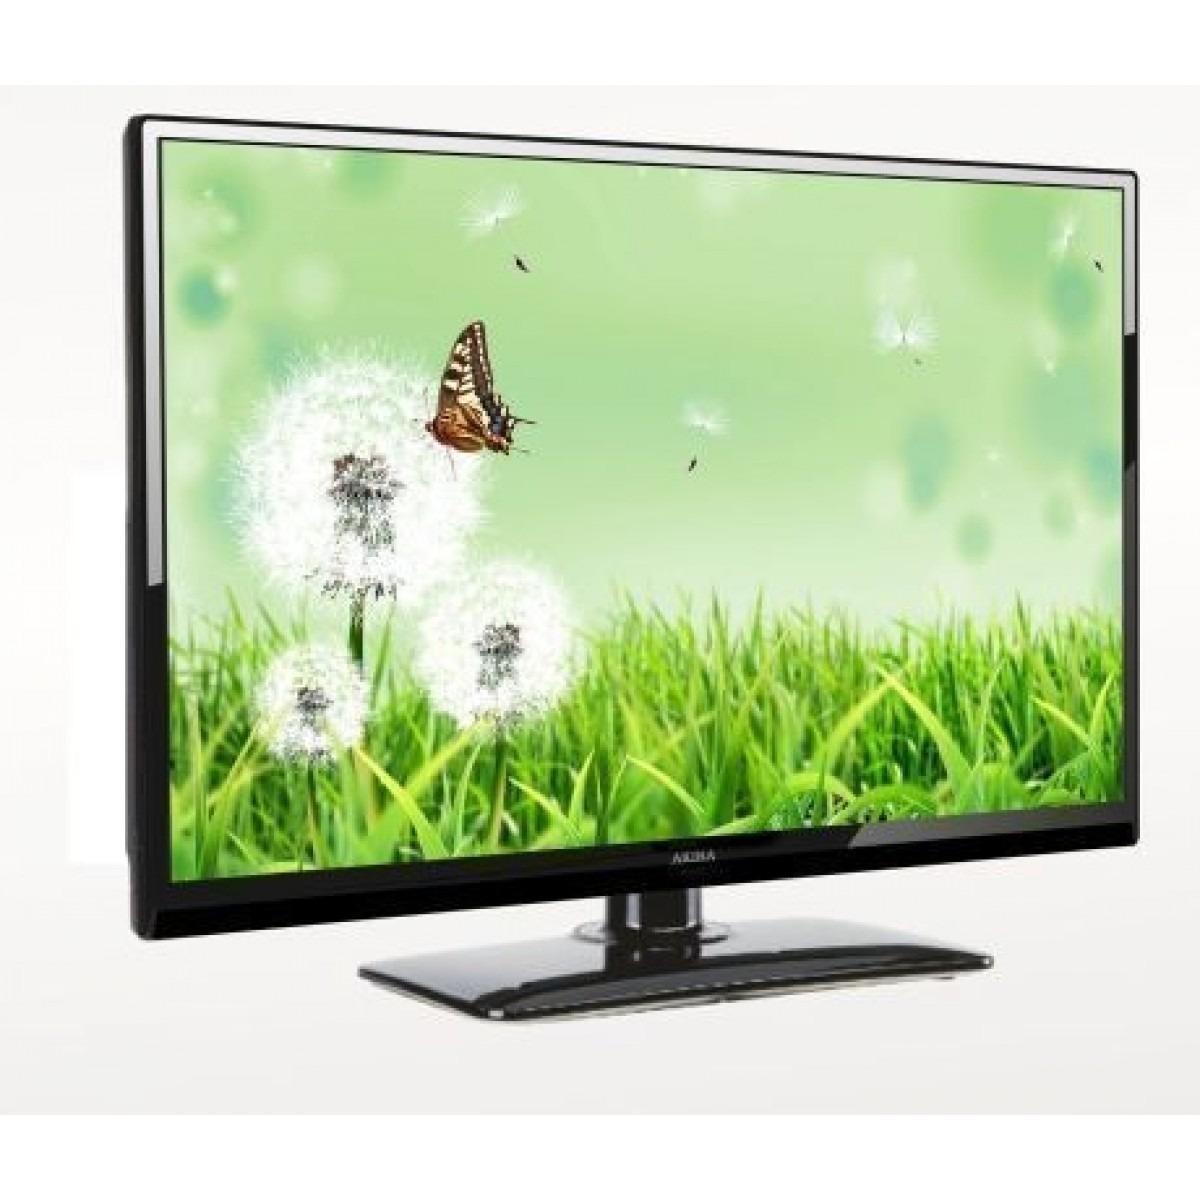 Akira 24 inch led tv